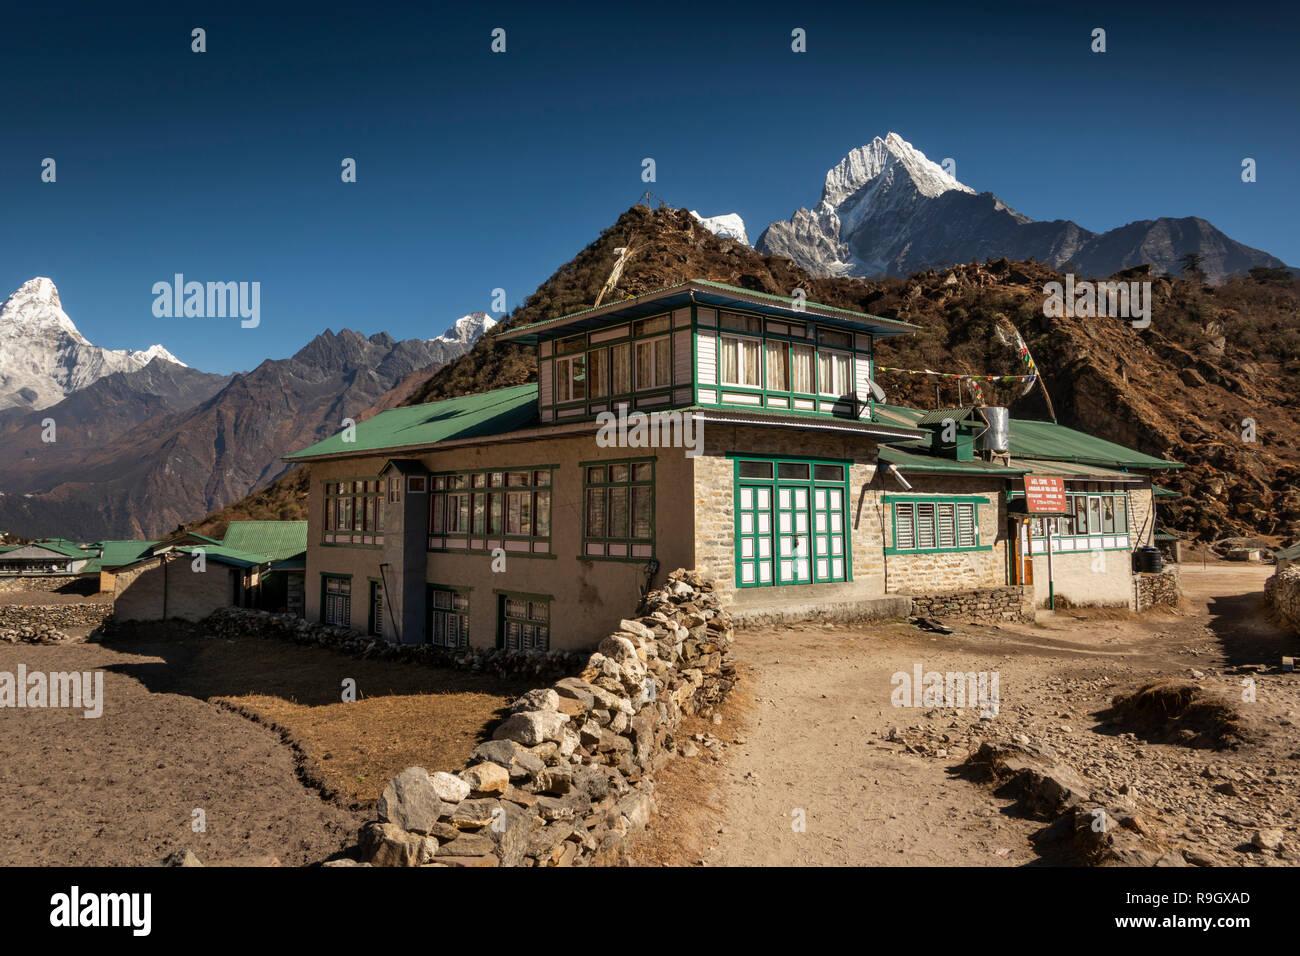 Nepal, Everest Base Camp Trek, Khumjung, winter, Amadablam Guest House at end of tourist season - Stock Image